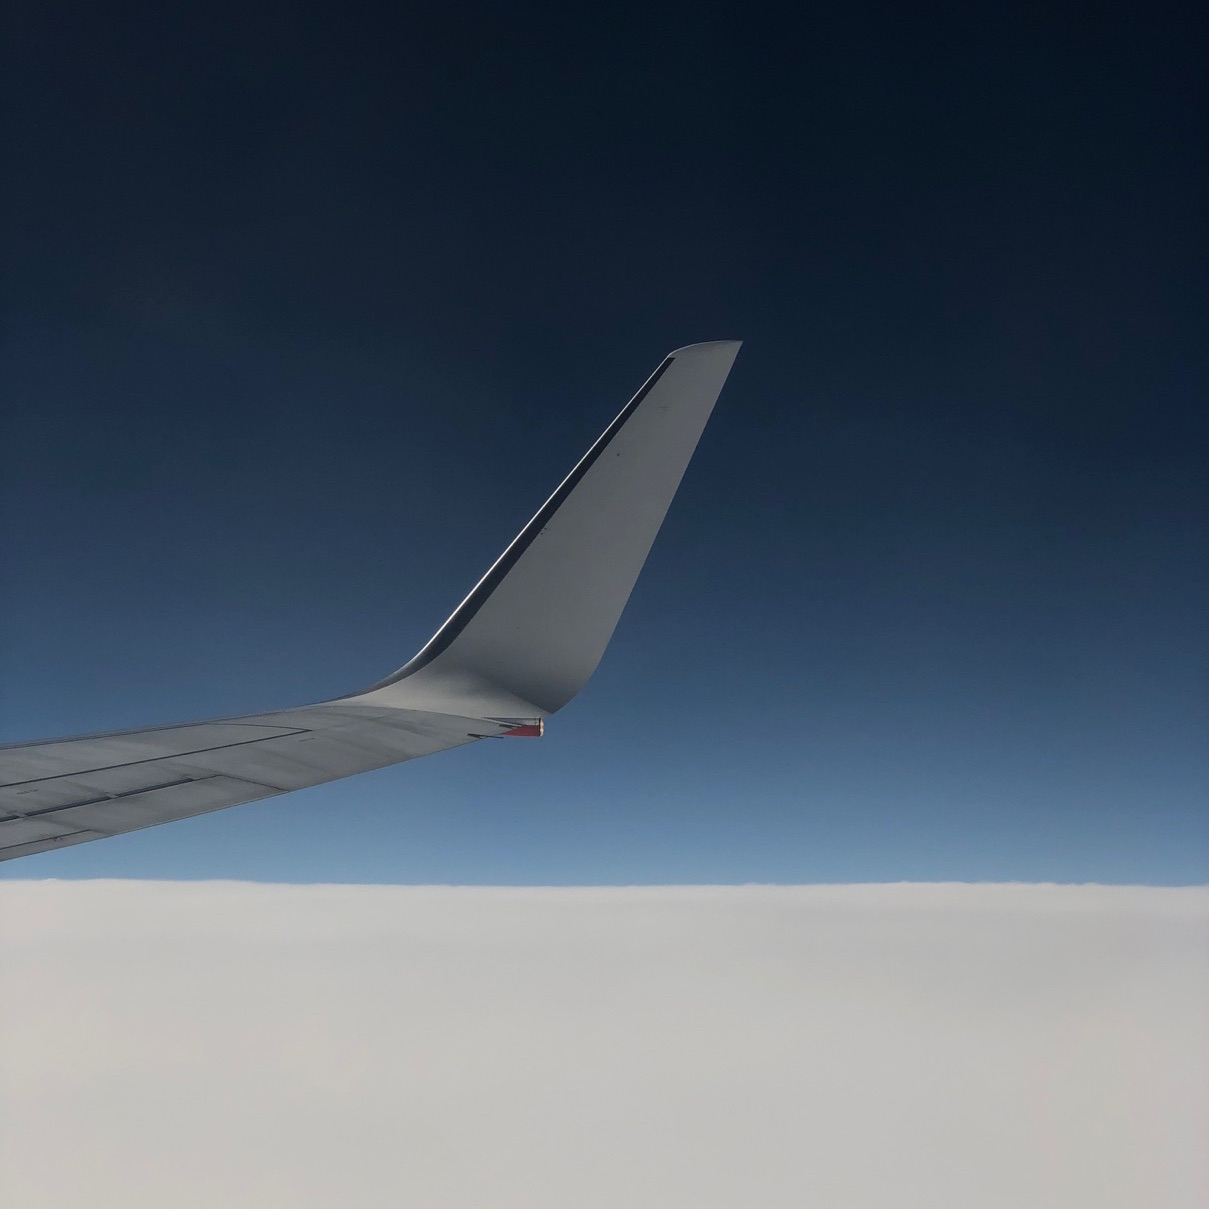 plane-wing-7.jpg